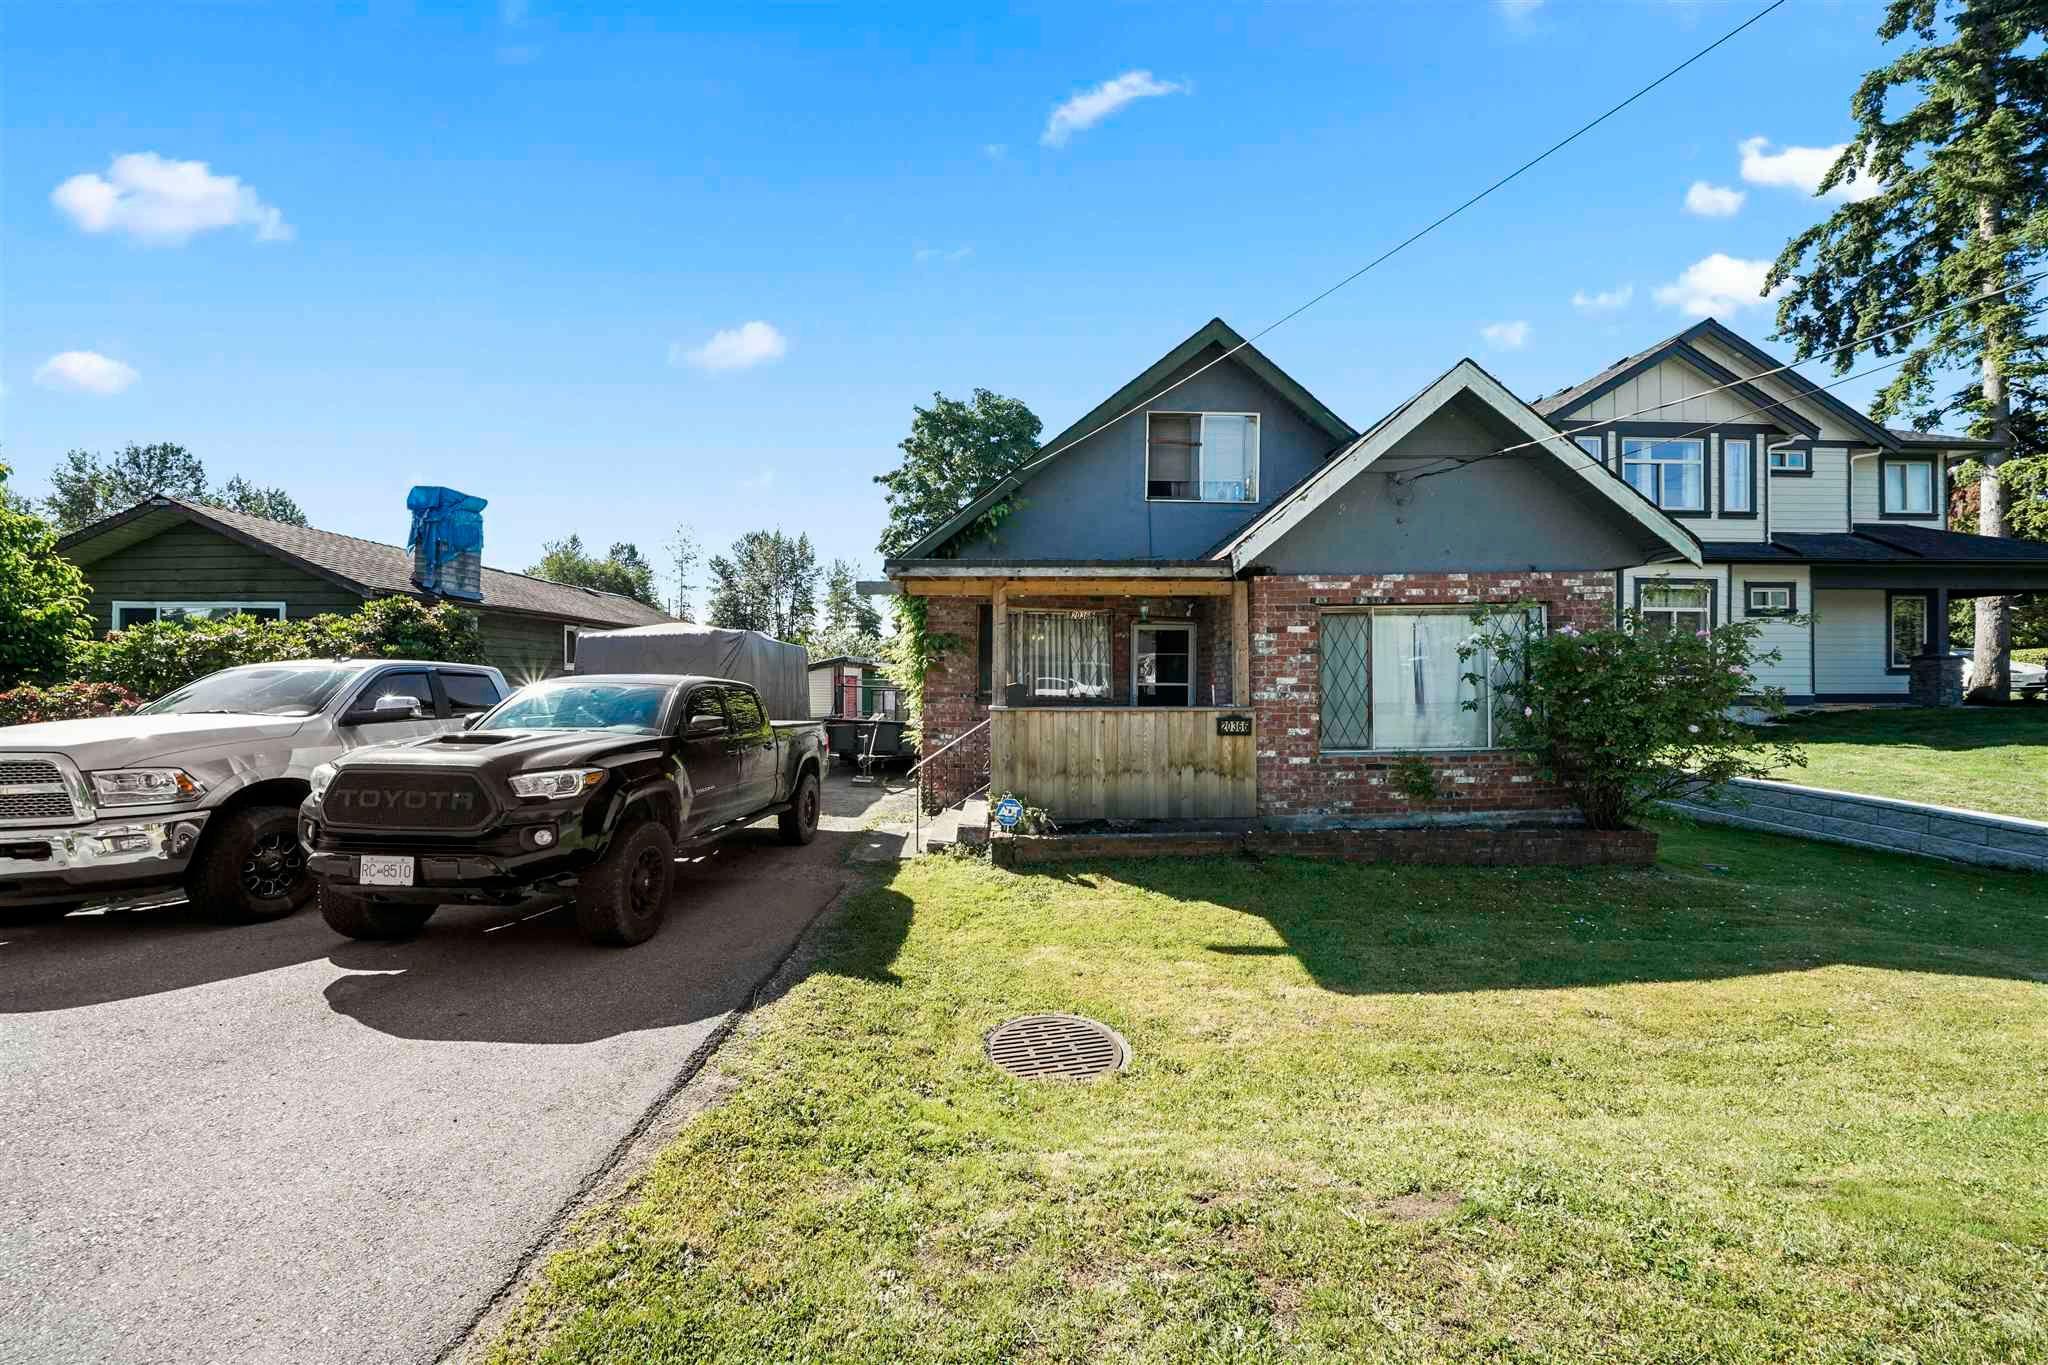 Main Photo: 20366 LORNE Avenue in Maple Ridge: Southwest Maple Ridge House for sale : MLS®# R2595034